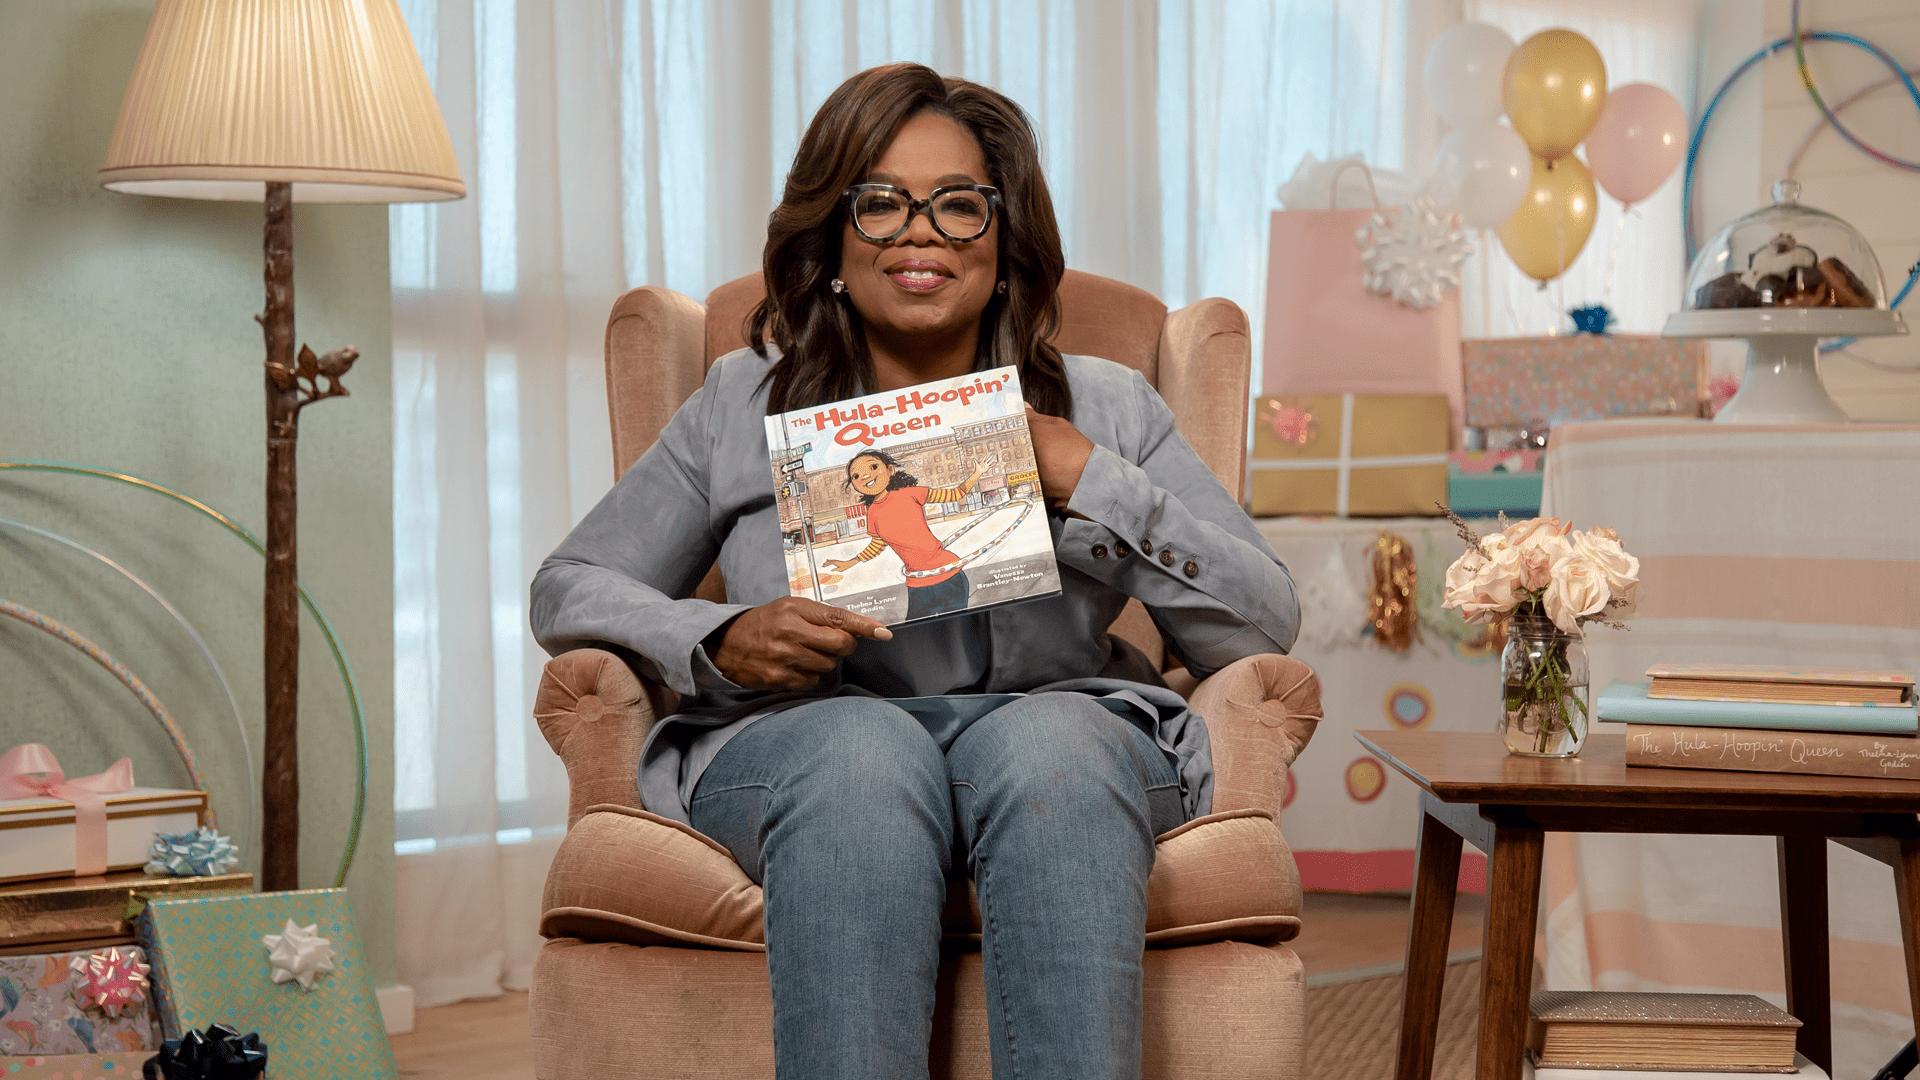 Oprah Winfrey reads The Hula-Hoopin' Queen for SAG-AFTRA Foundation's children's literacy program Storyline Online®